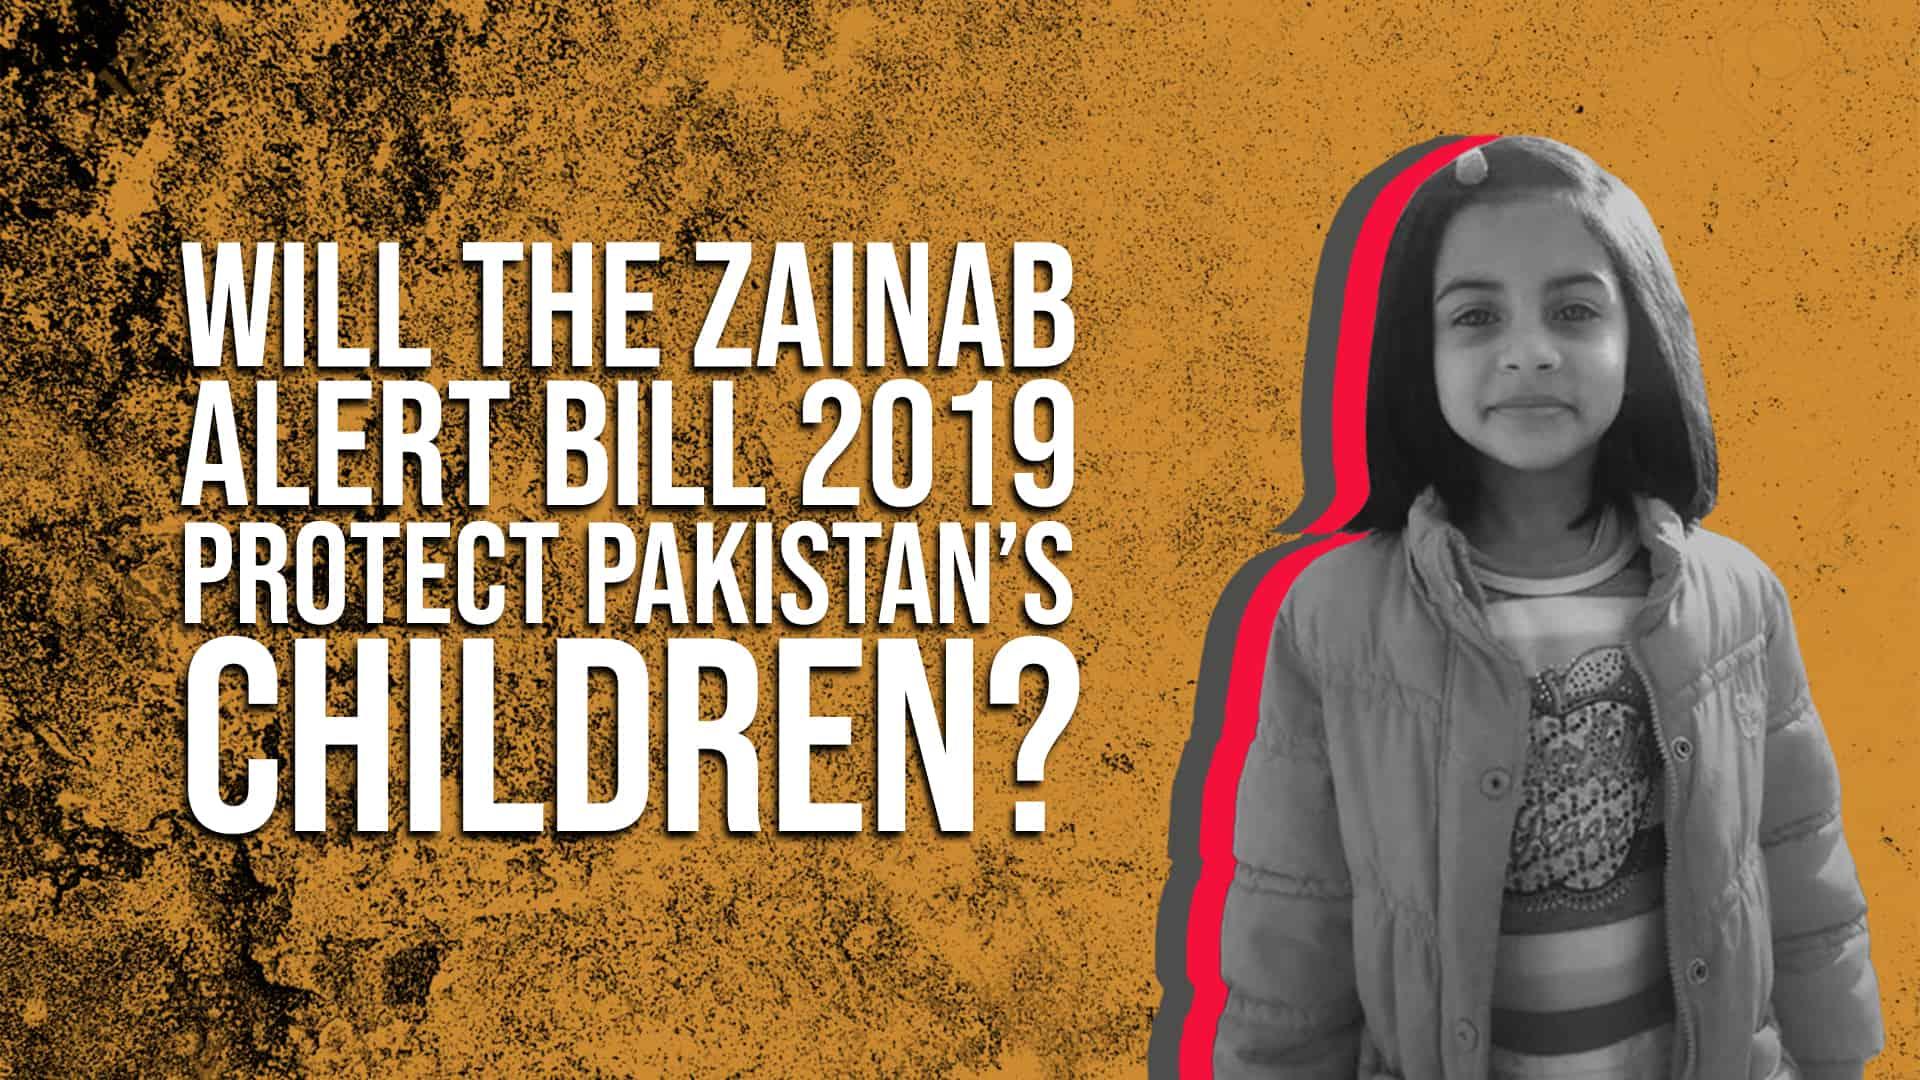 Will the Zainab Alert Bill 2019 Protect Pakistan's Children?